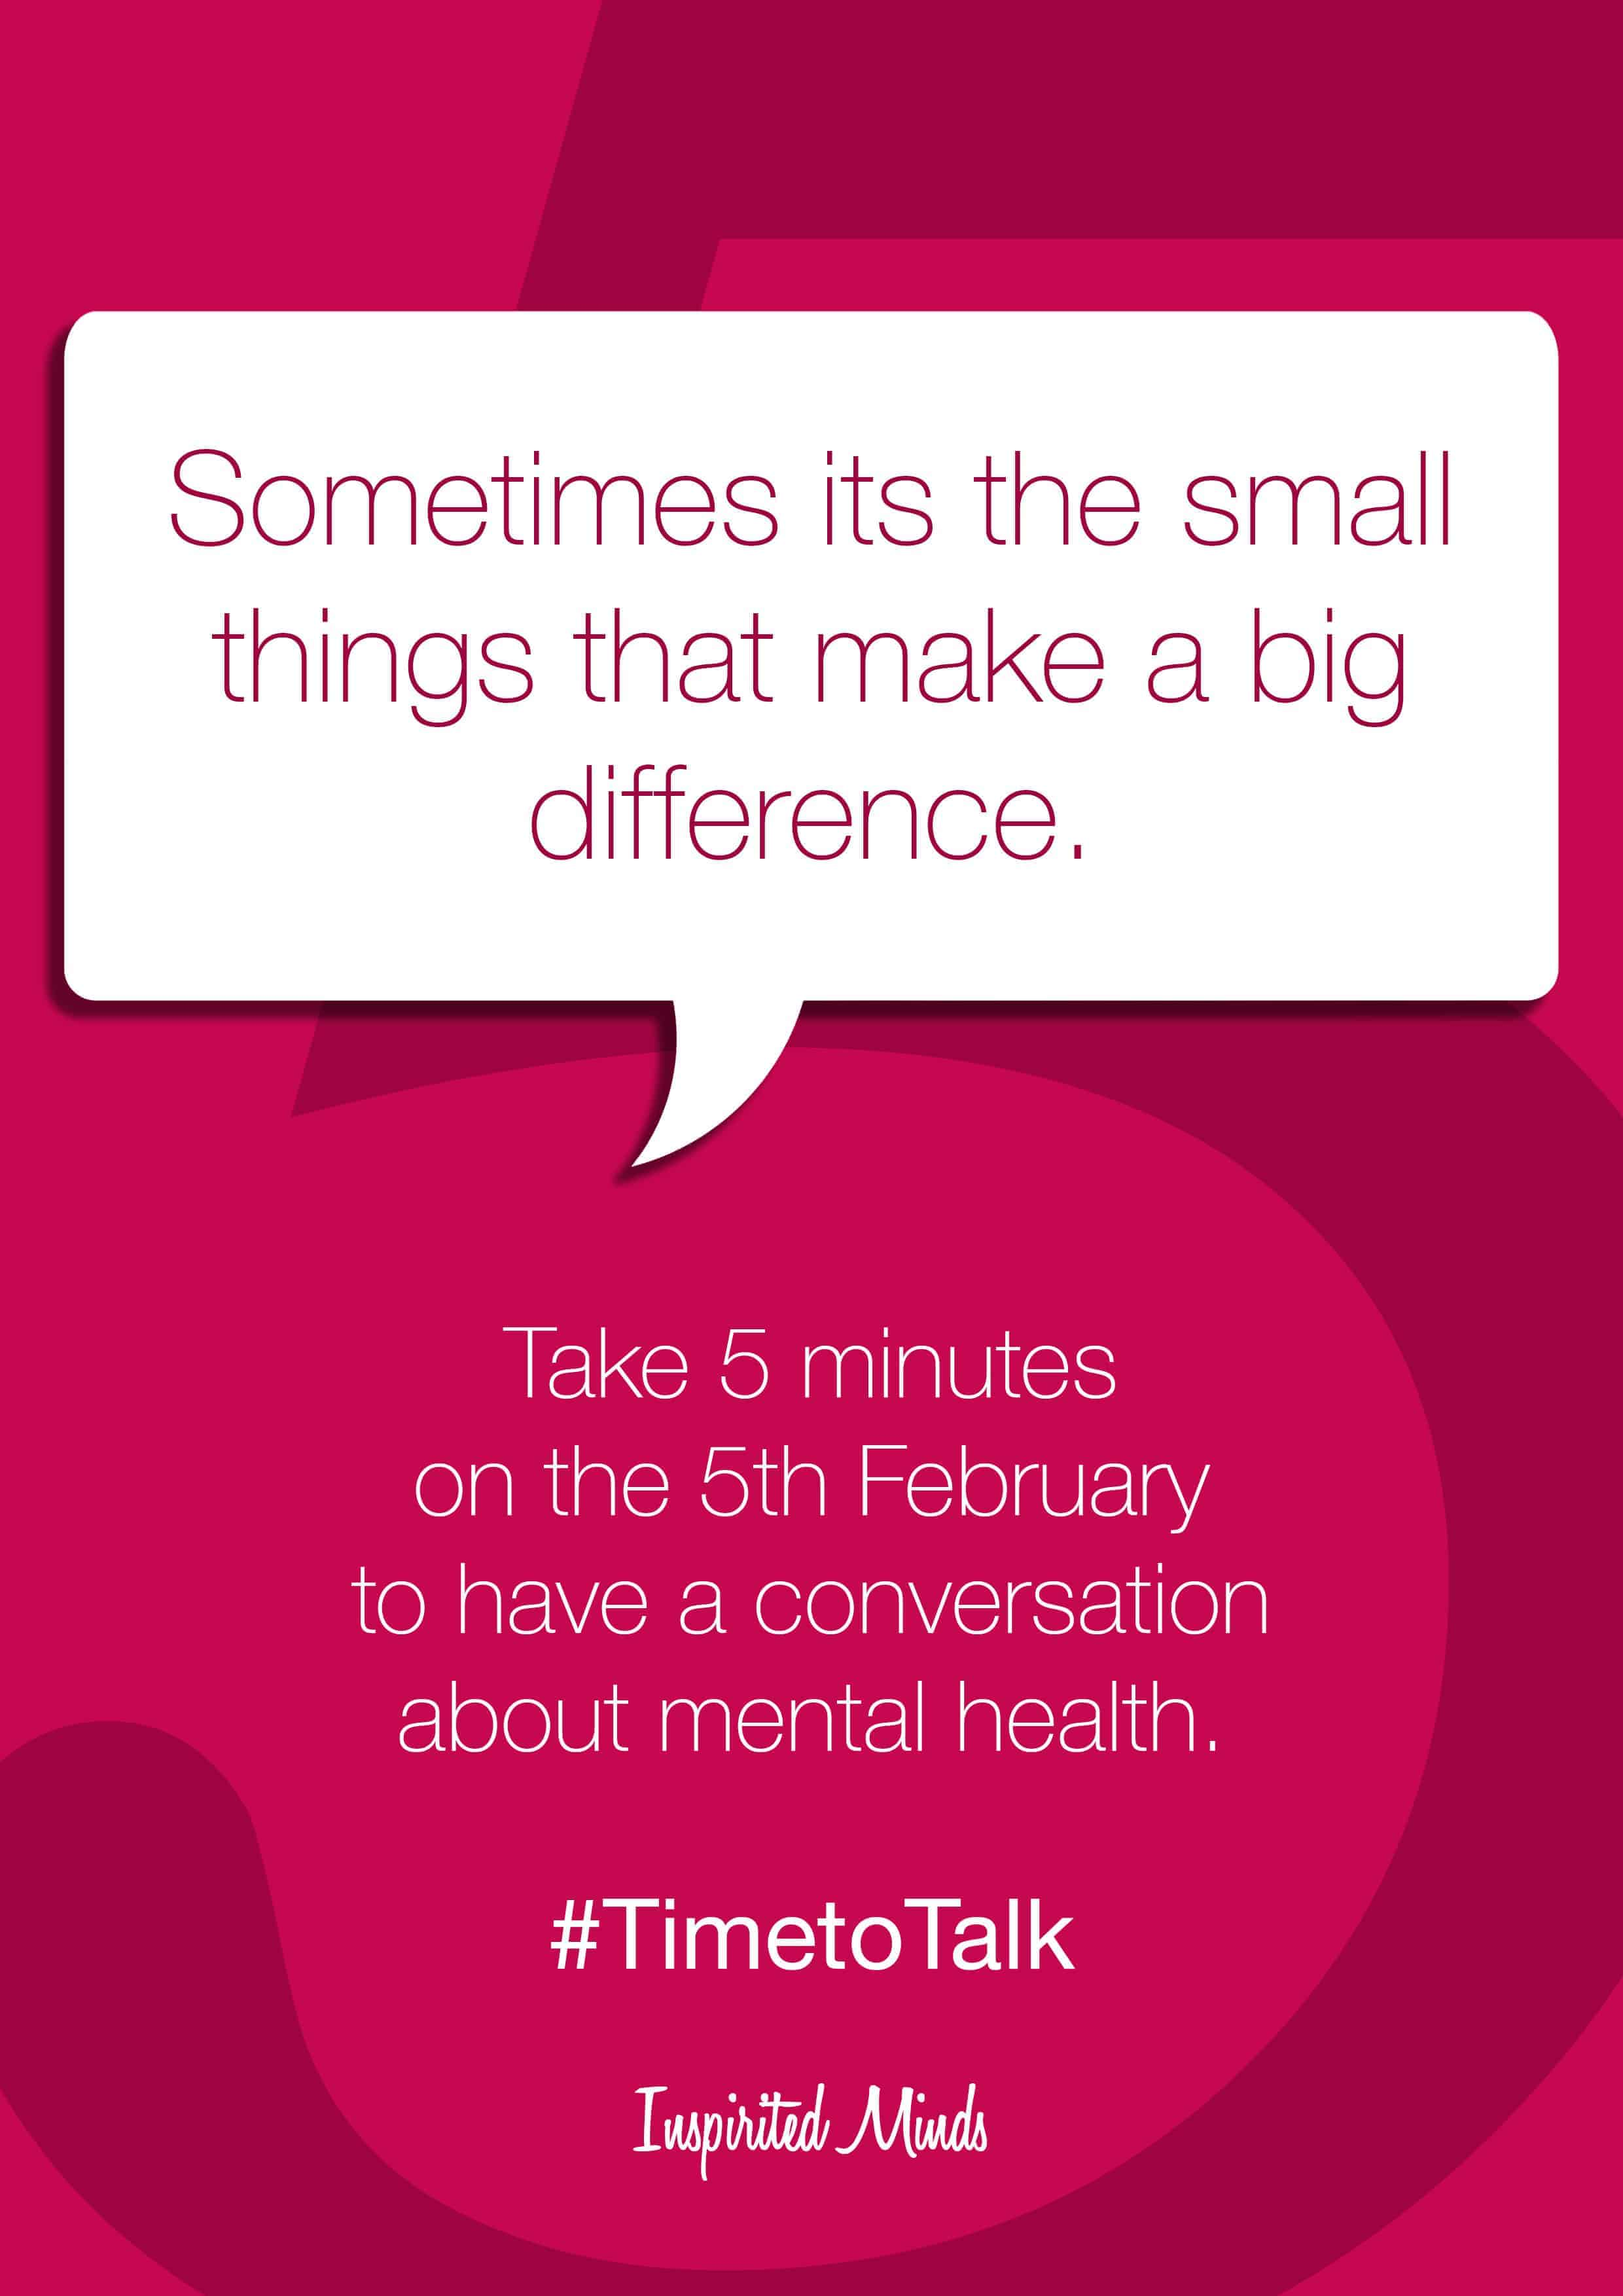 #TimetoTalk